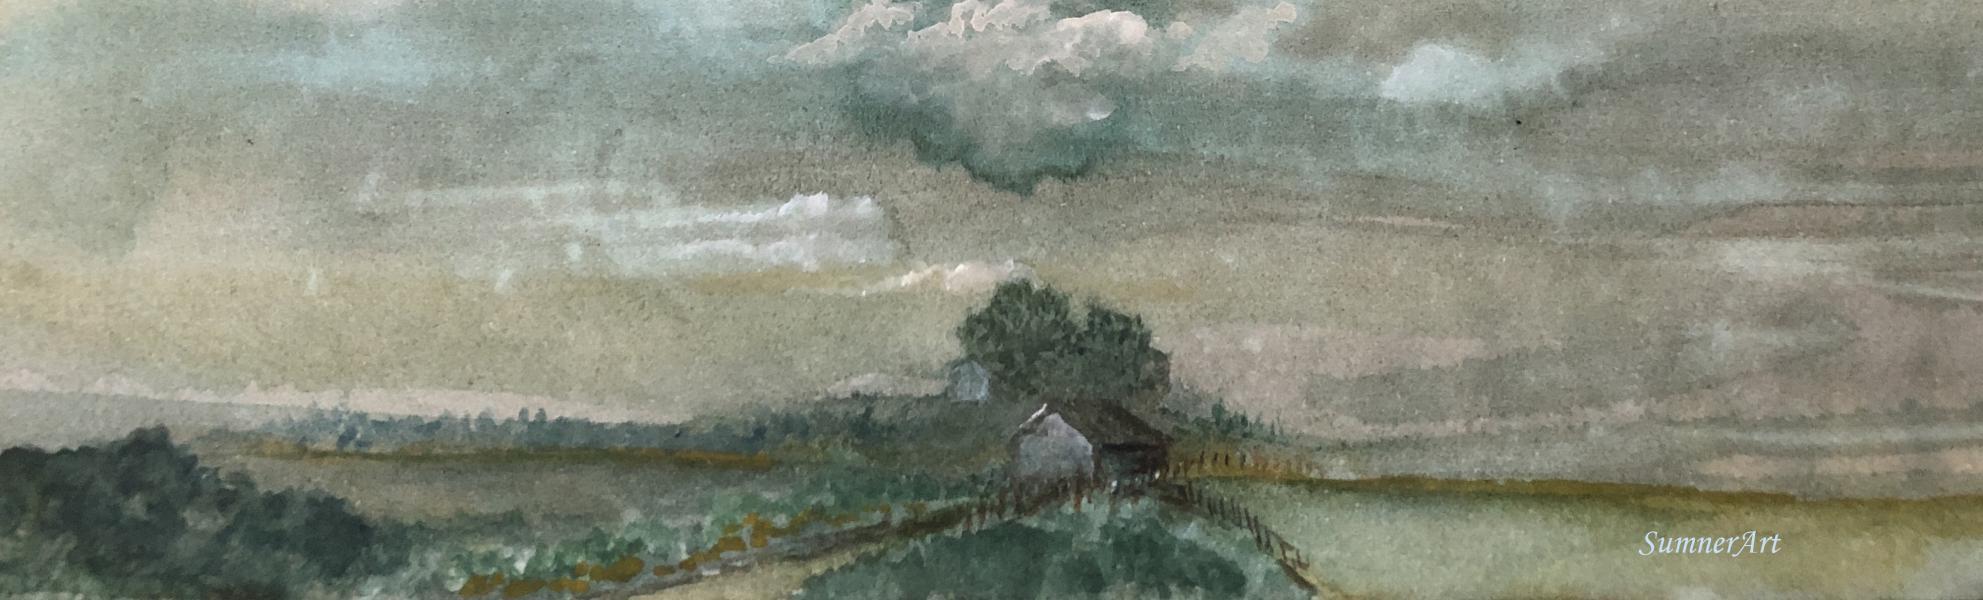 farm, open field, house, singular, clouds, contemporary landscape